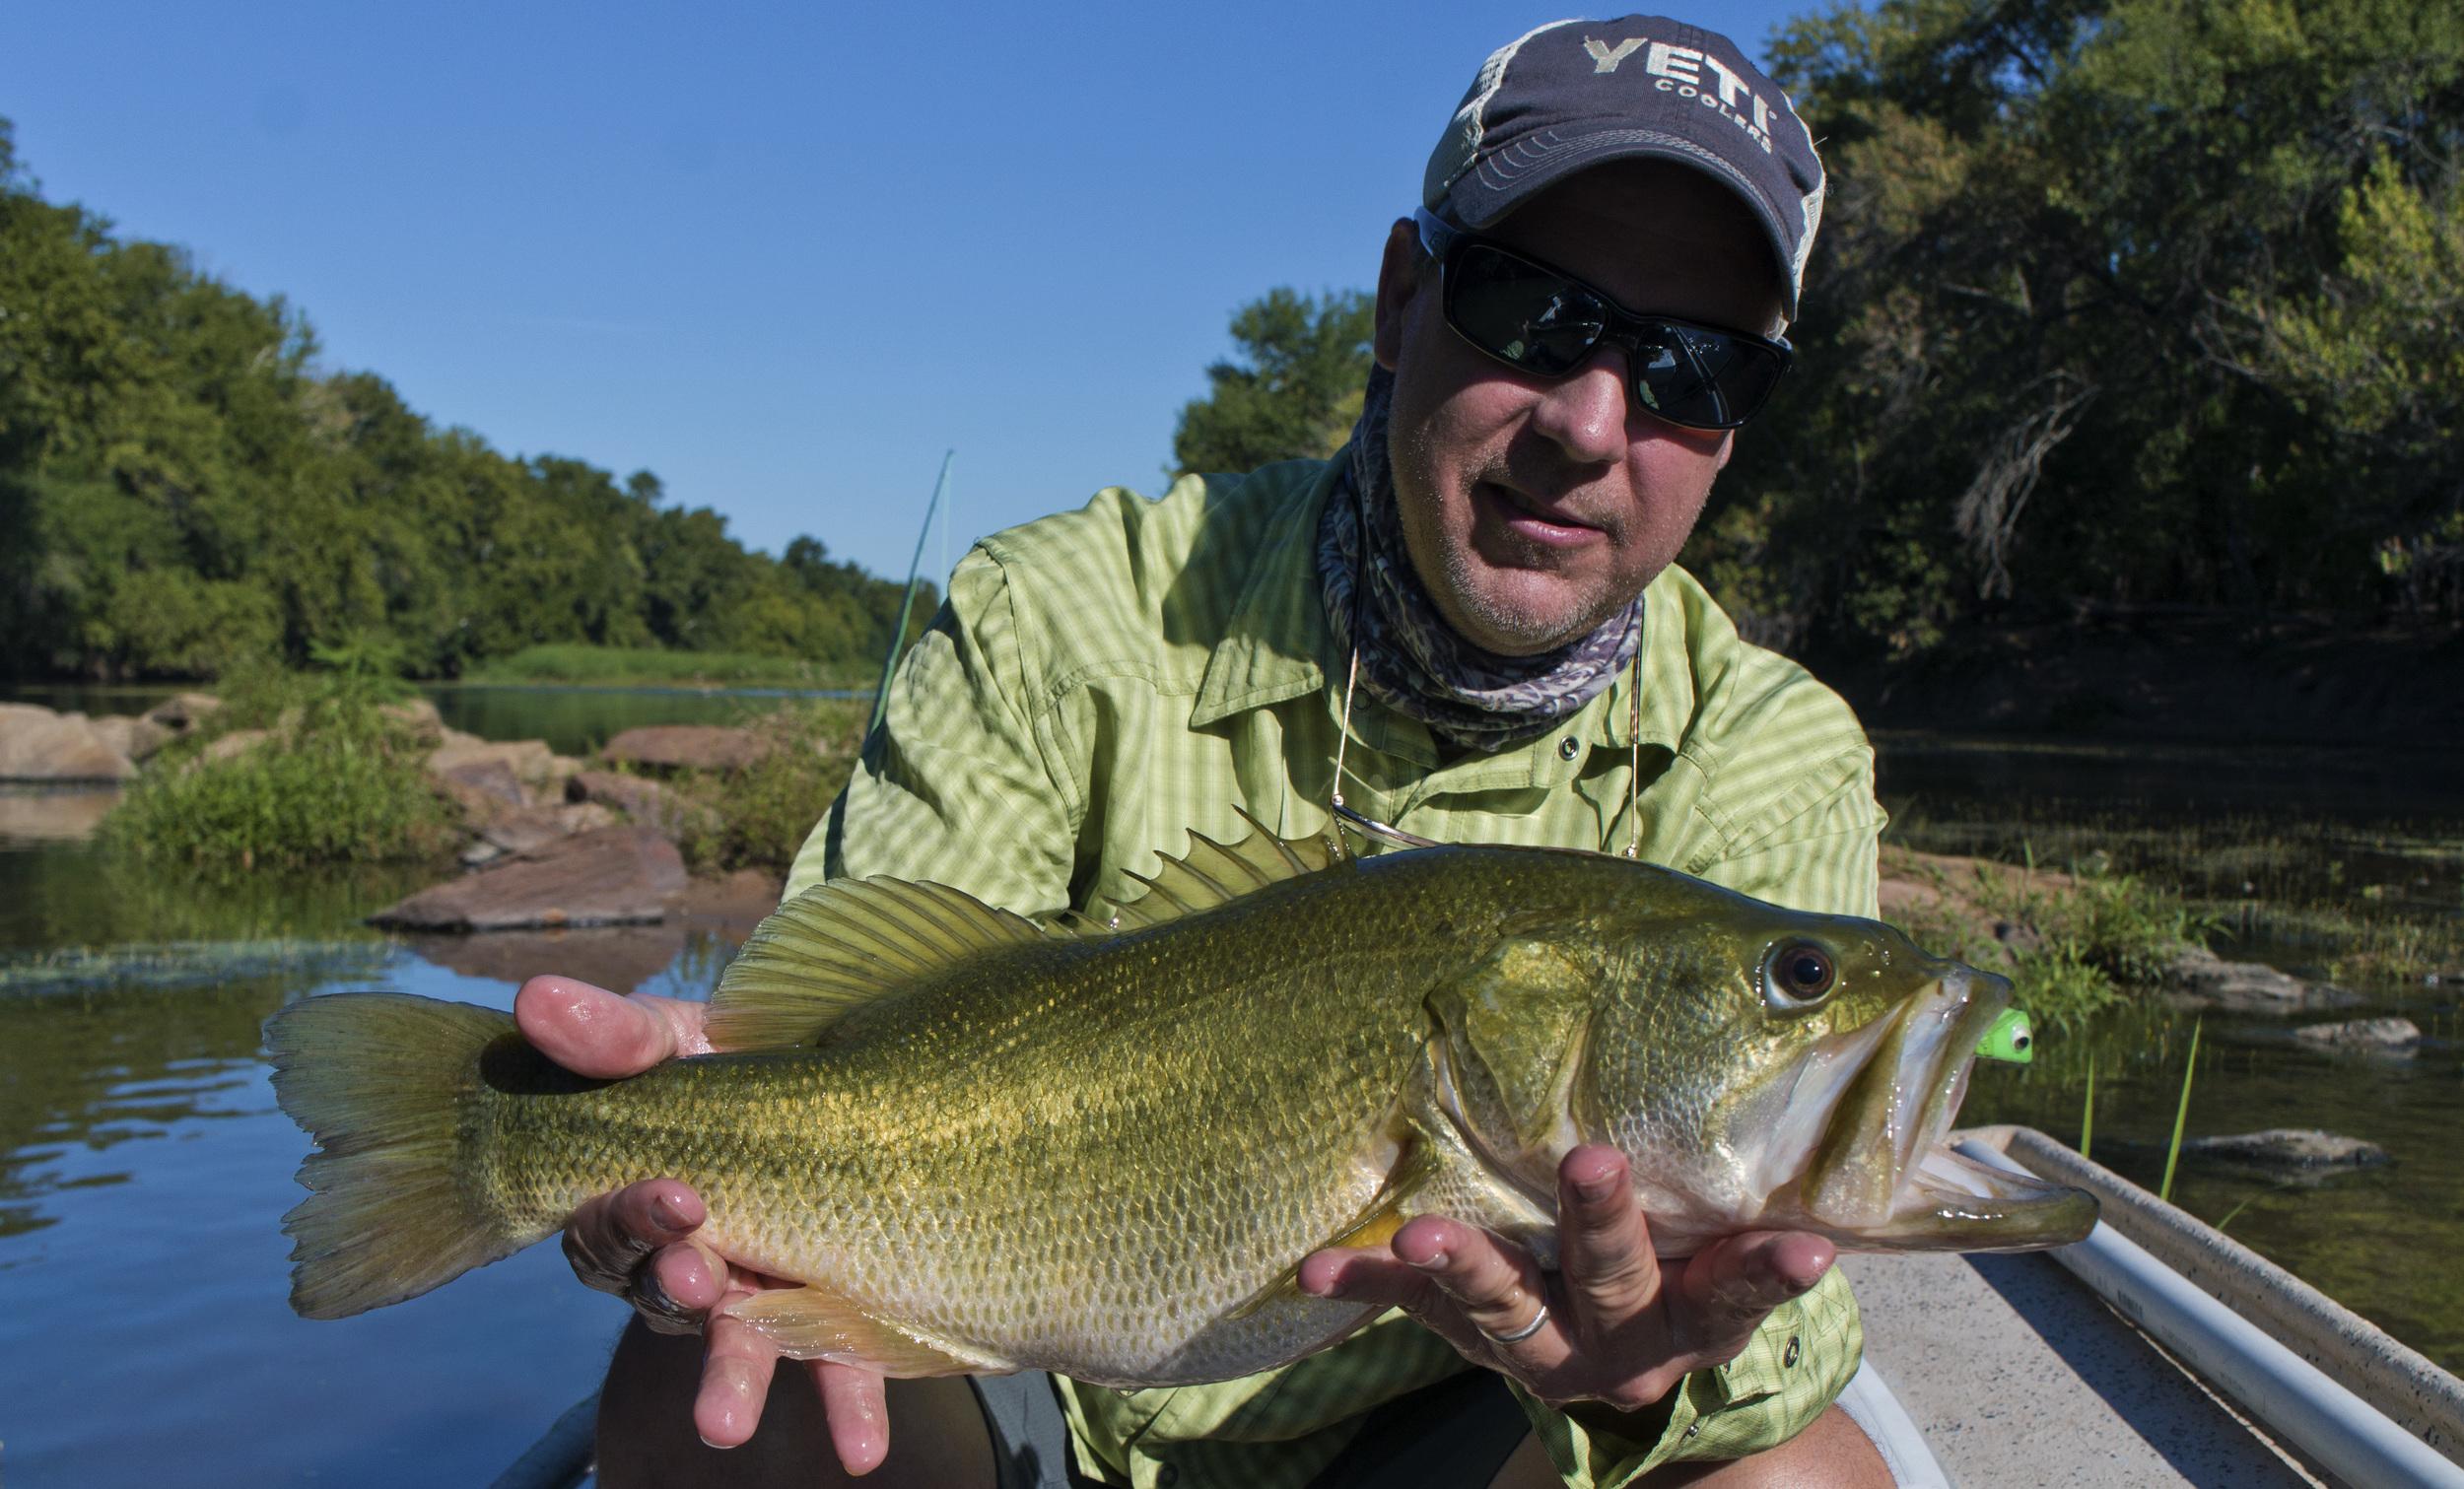 Jeff Davis with a 5 pound Colorado River bass